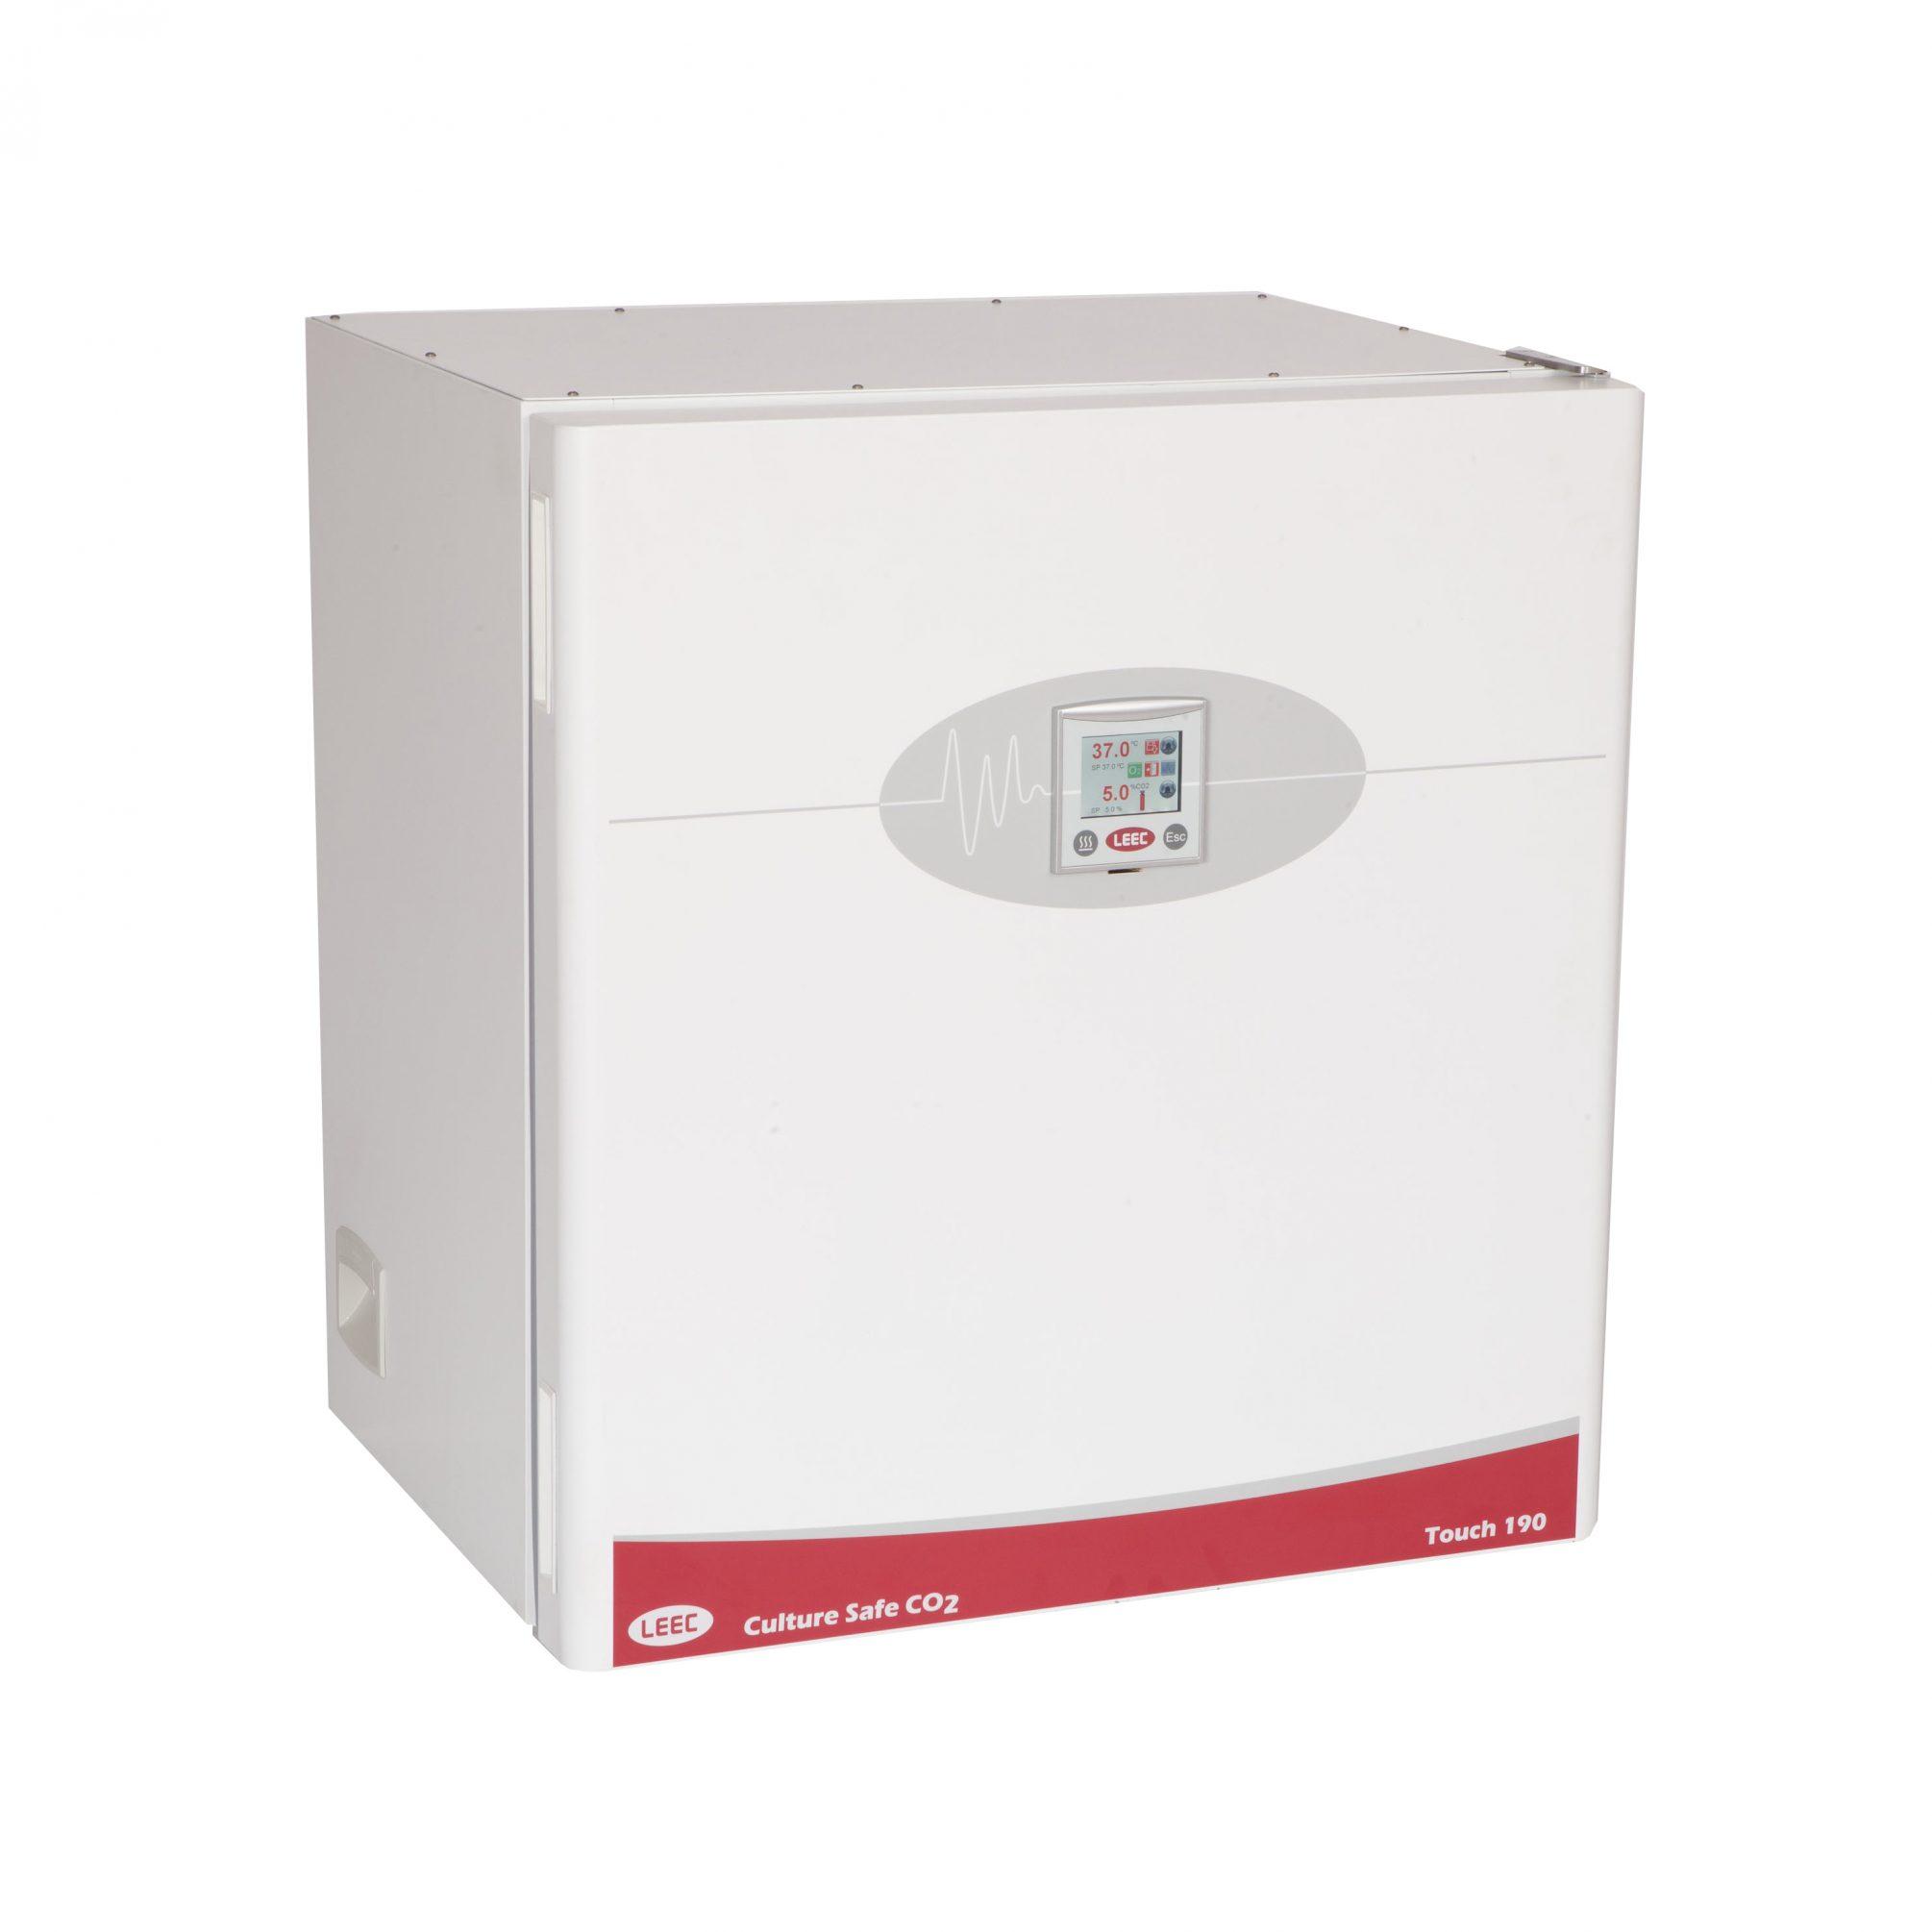 Touch 190 Culture Safe CO2 Incubator, 190L, LEEC